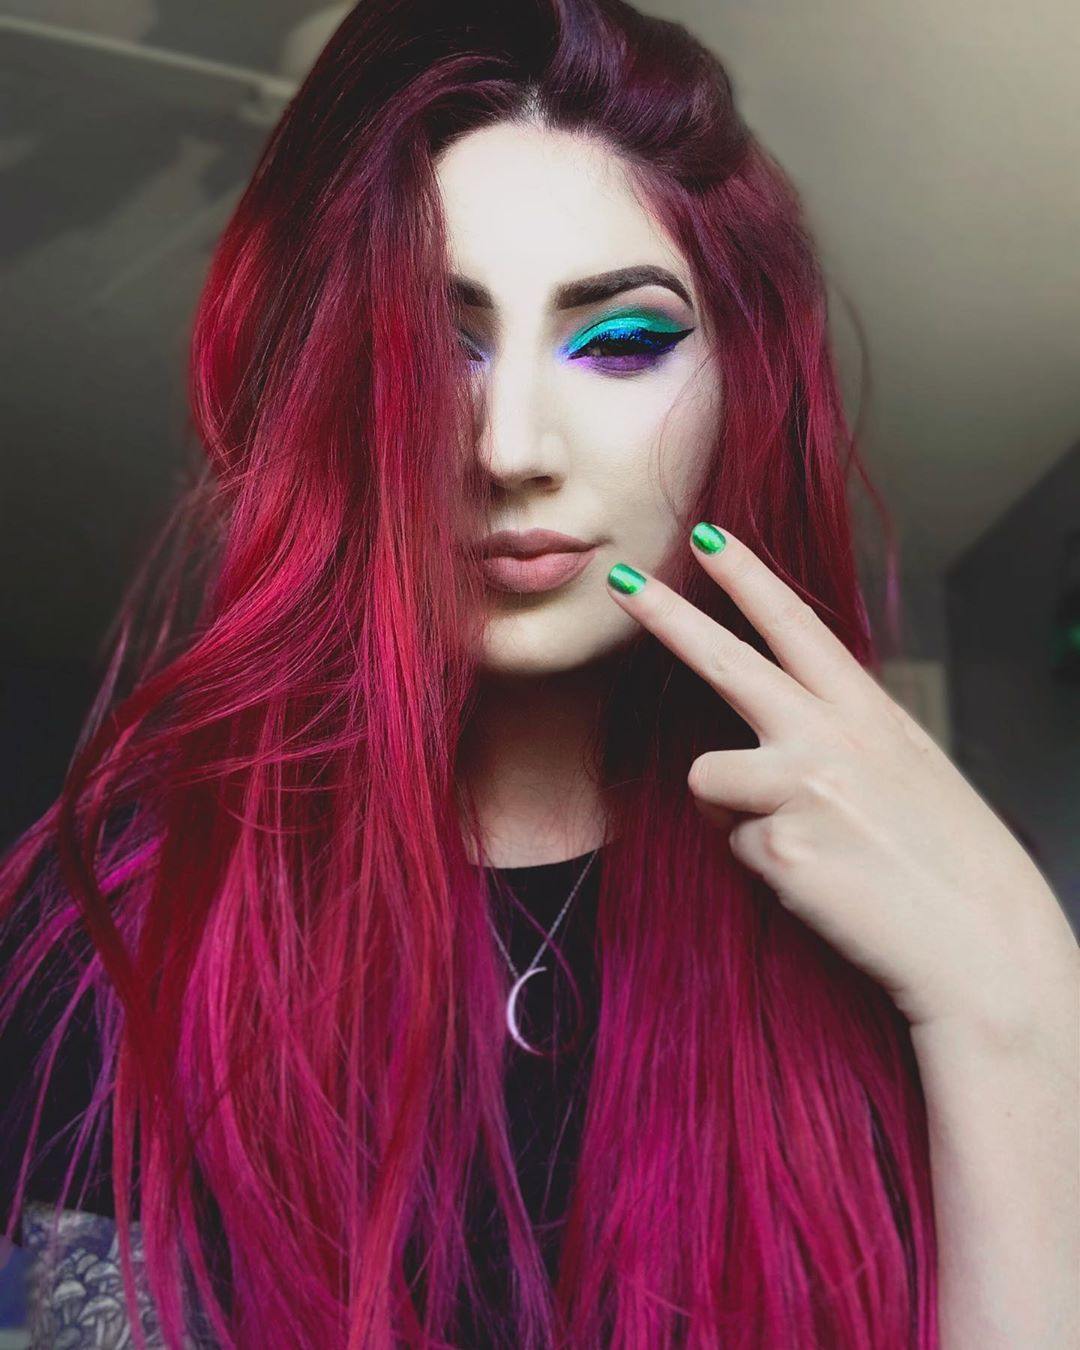 Arctic Fox Hair Color Kayladaniellea Really Feeling This Arcticfoxhaircolor Mash Up Of Shades Virgin Pink And Wrath A Fox Hair Dye Hot Pink Hair Hair Color